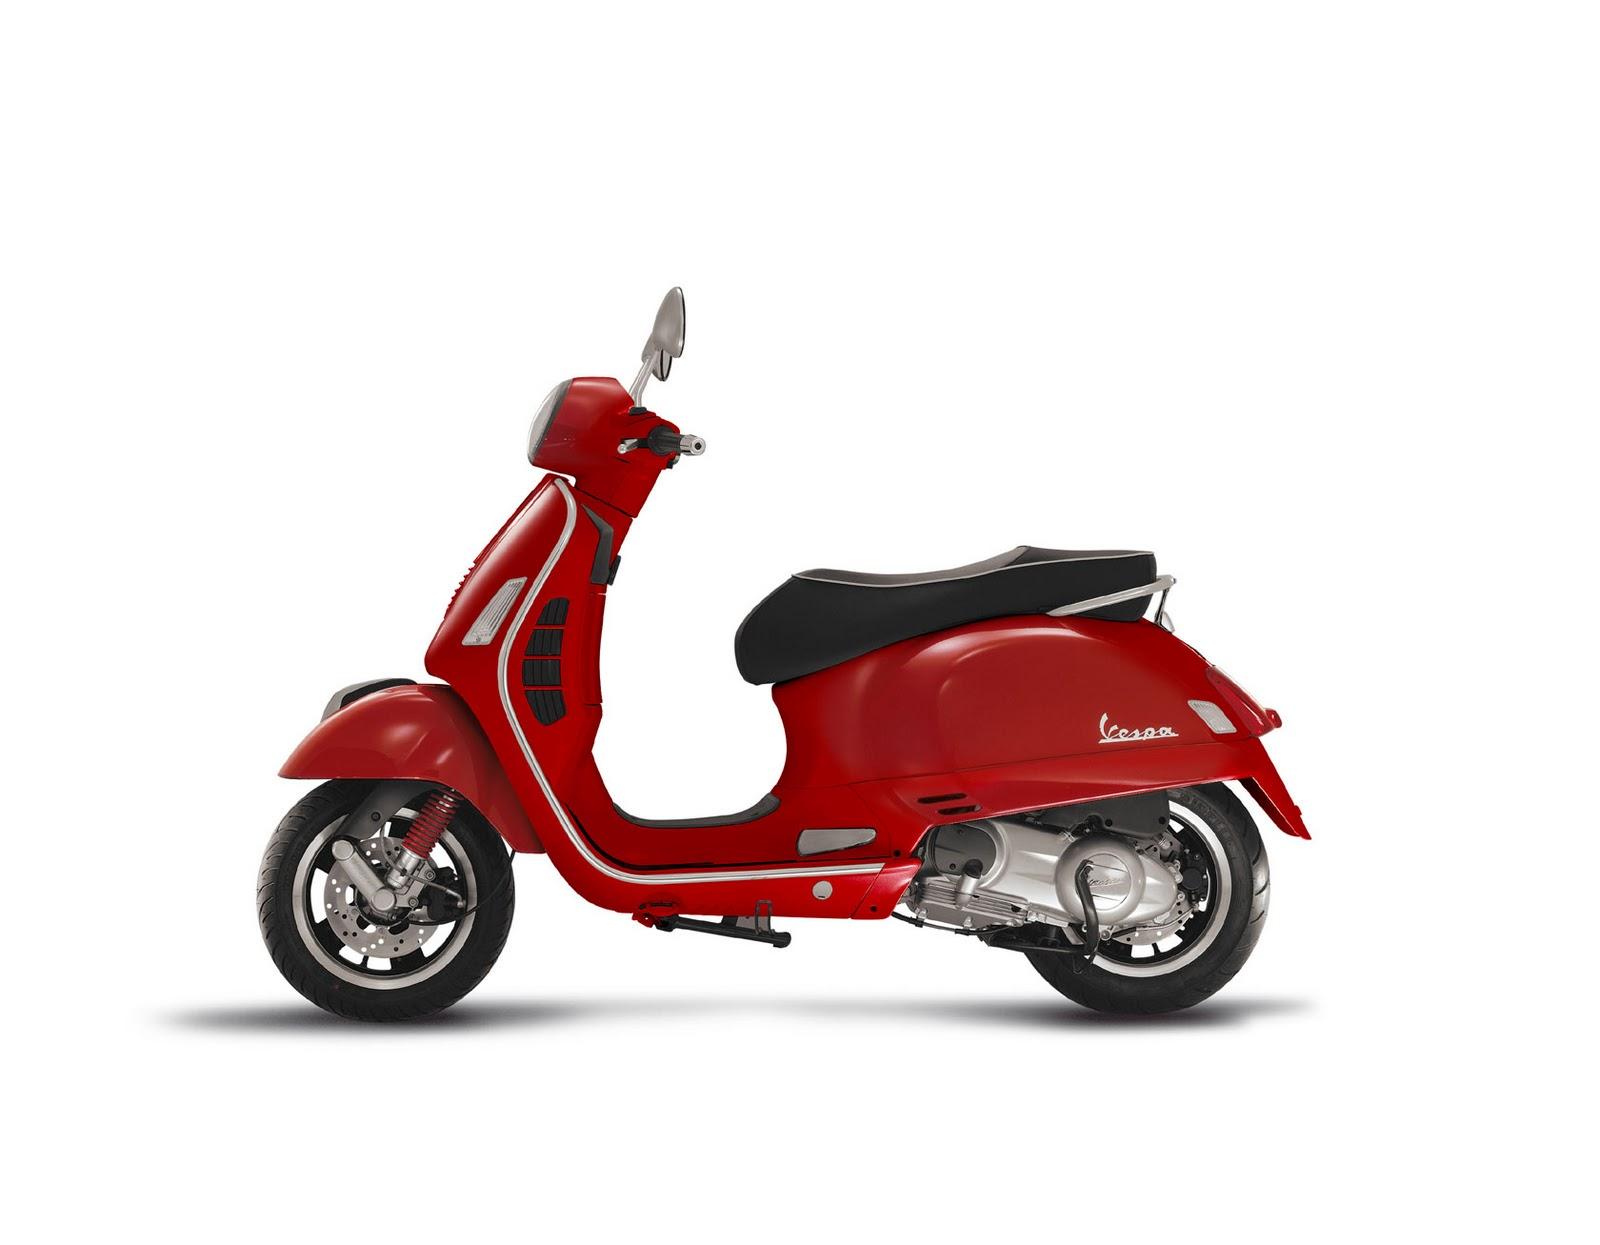 motorcycle pictures vespa gts 300 super 2009 europe. Black Bedroom Furniture Sets. Home Design Ideas